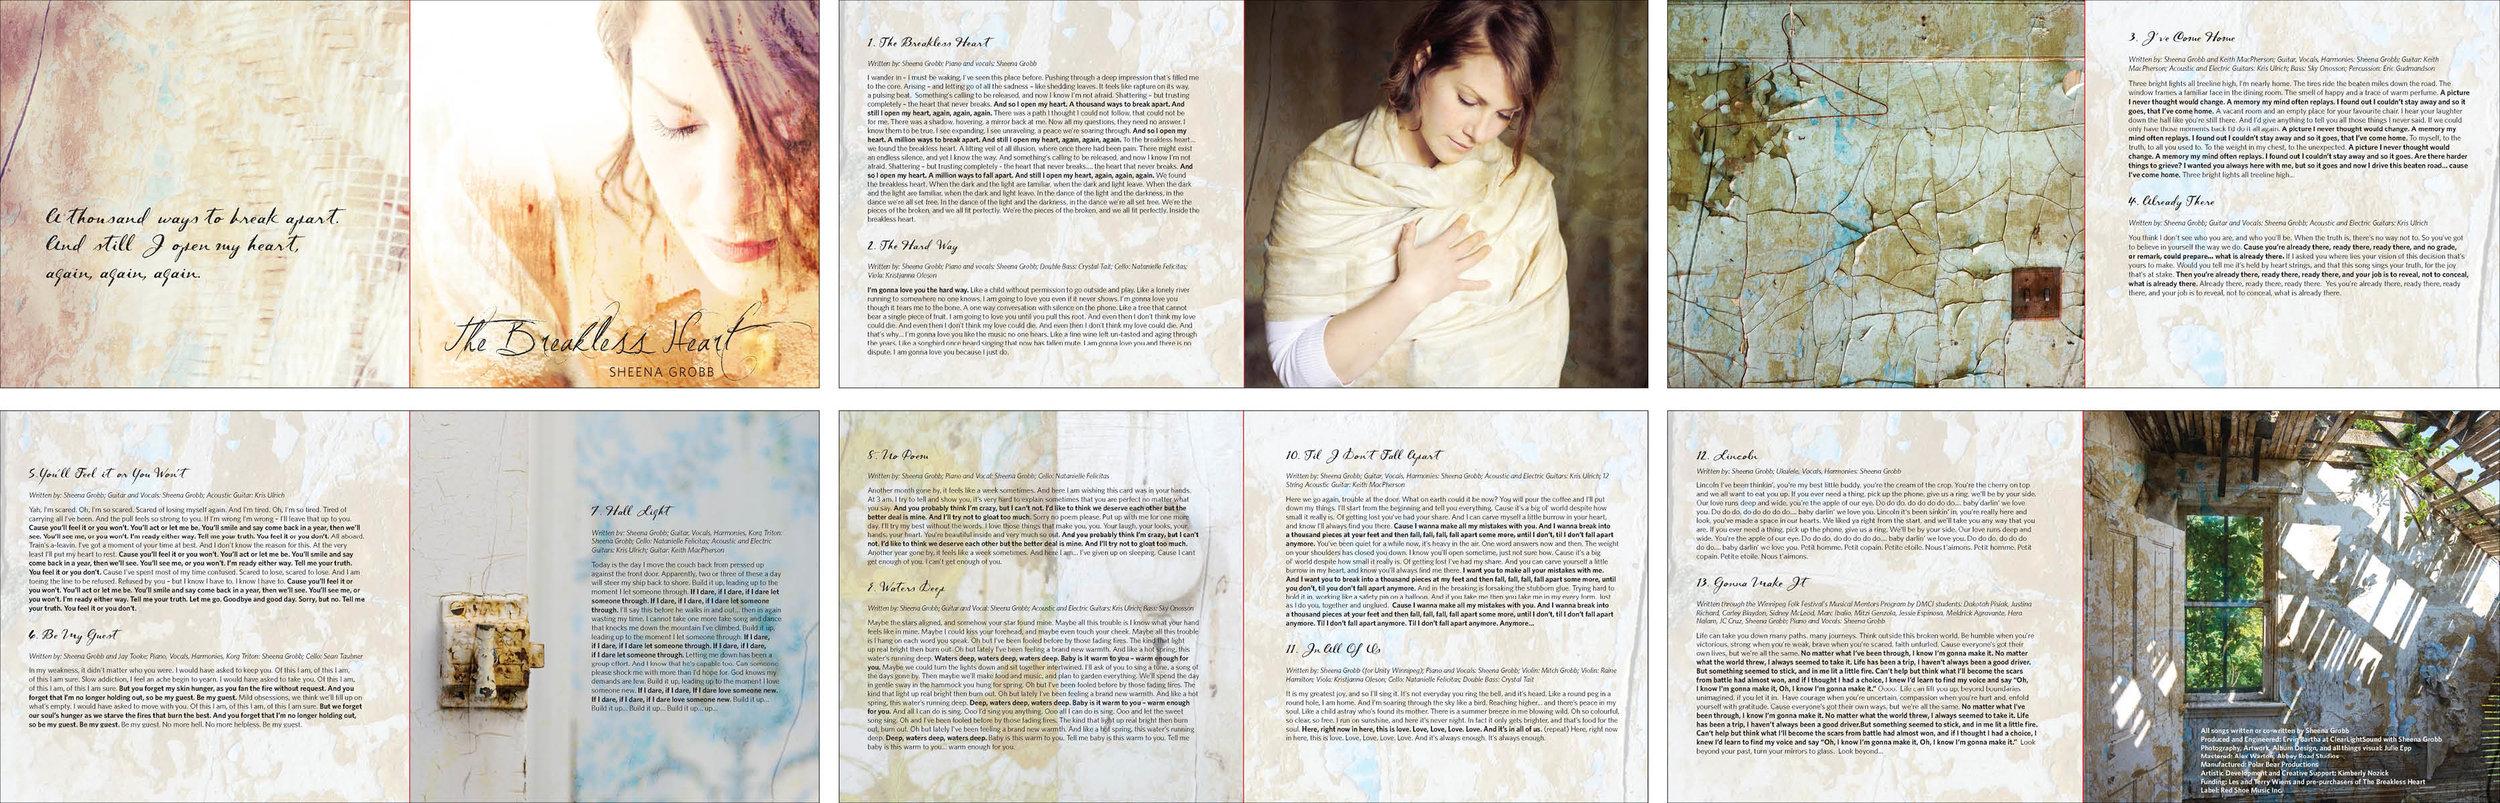 Sheena Grobb The Breakless Heart - album artwork (photography/design)